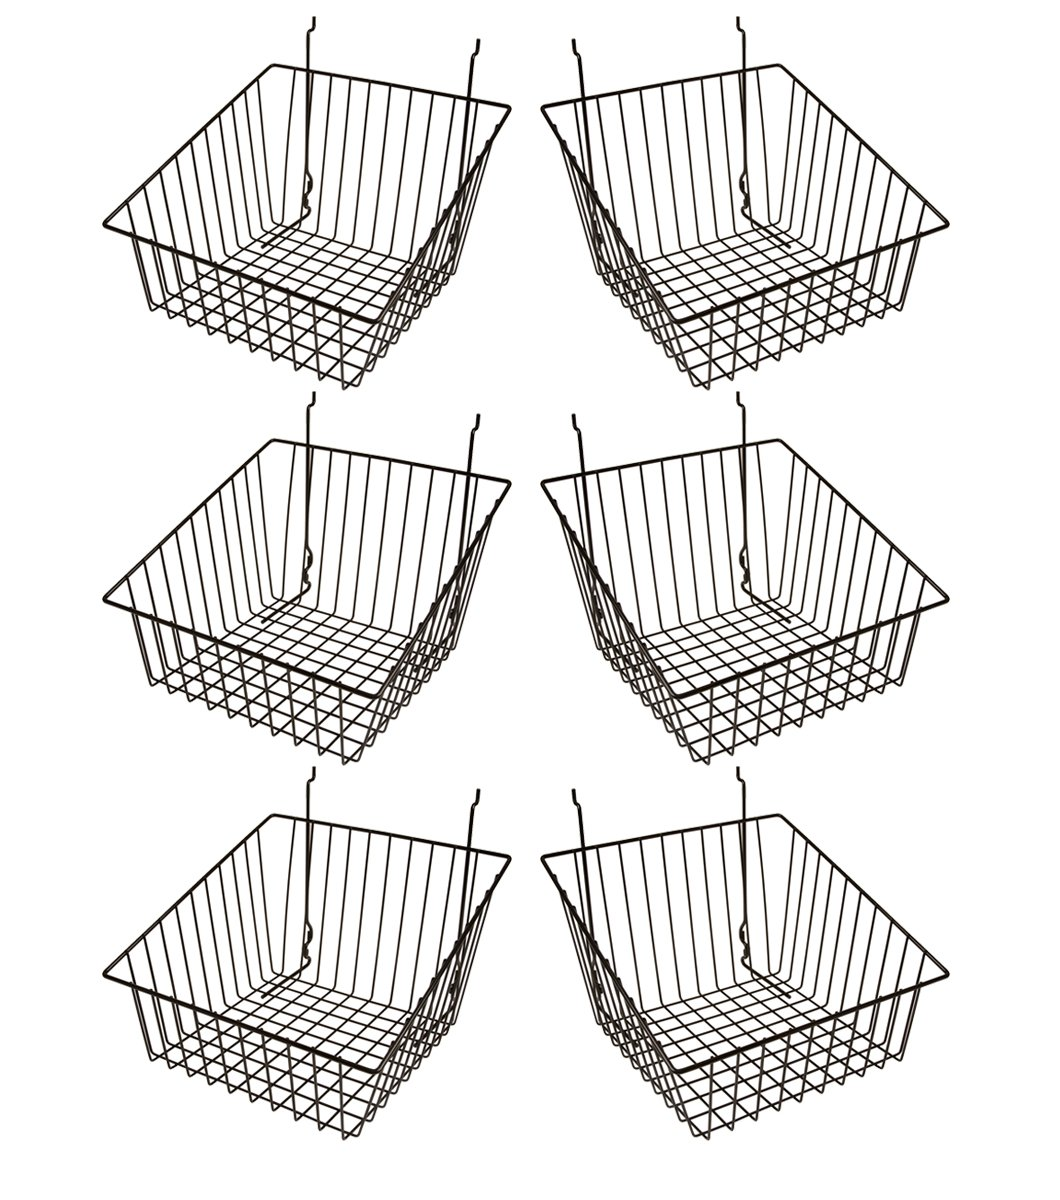 Econoco - Black Multi-Fit Sloped Front Wire Basket for Slatwall, Pegboard or Gridwall (Set of 6) Metal Semi-Gloss Basket, Black